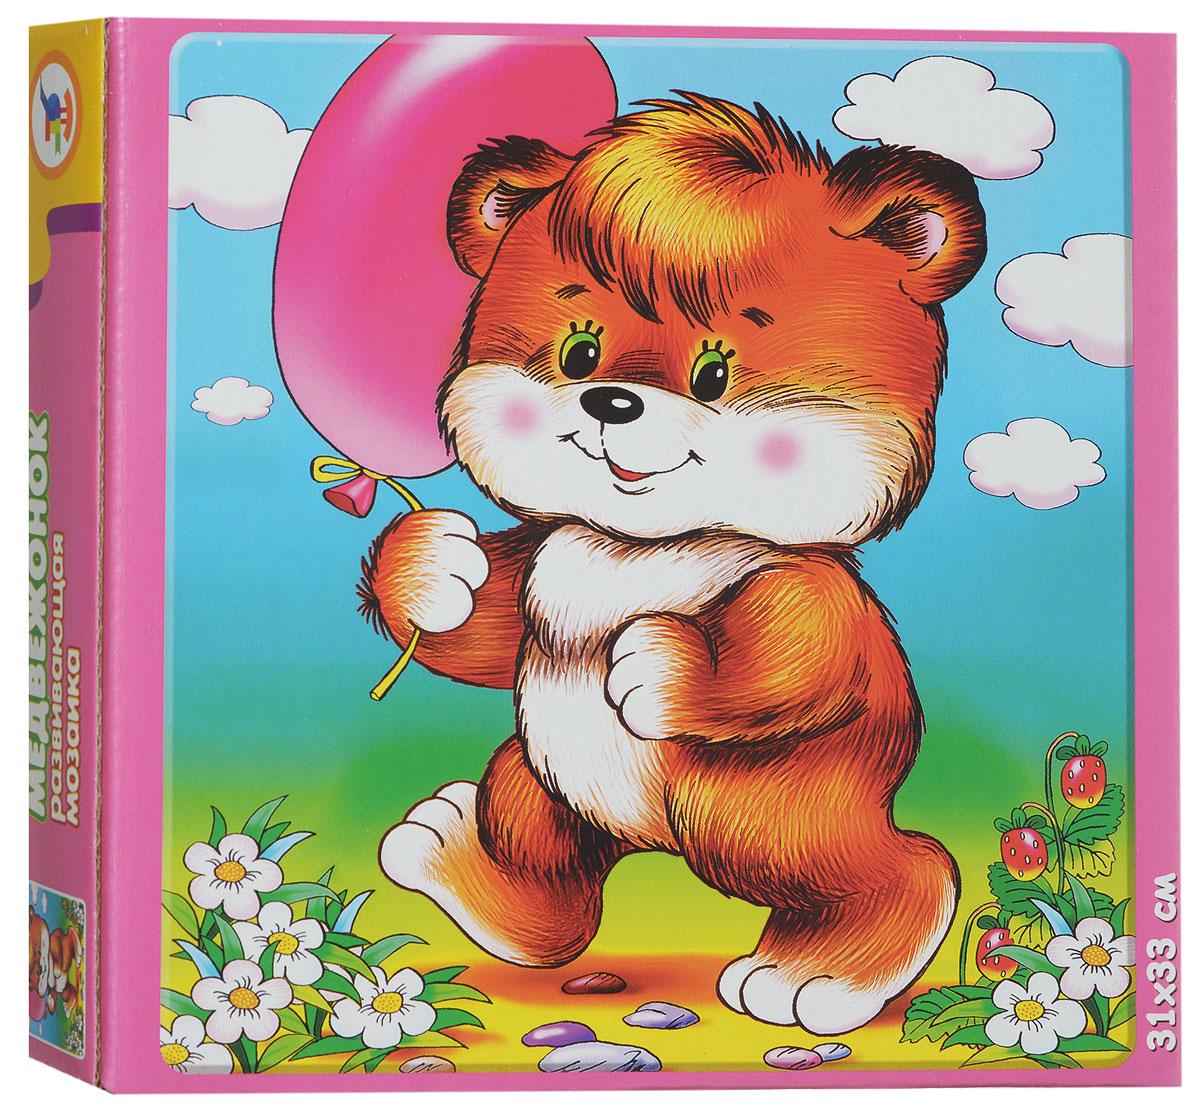 Дрофа-Медиа Пазл для малышей Медвежонок дрофа медиа пазл для малышей играй и собирай 4 в 1 2938